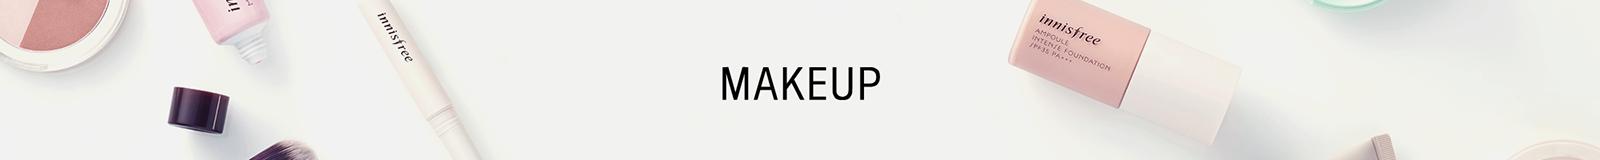 Innisfree Make up - Title